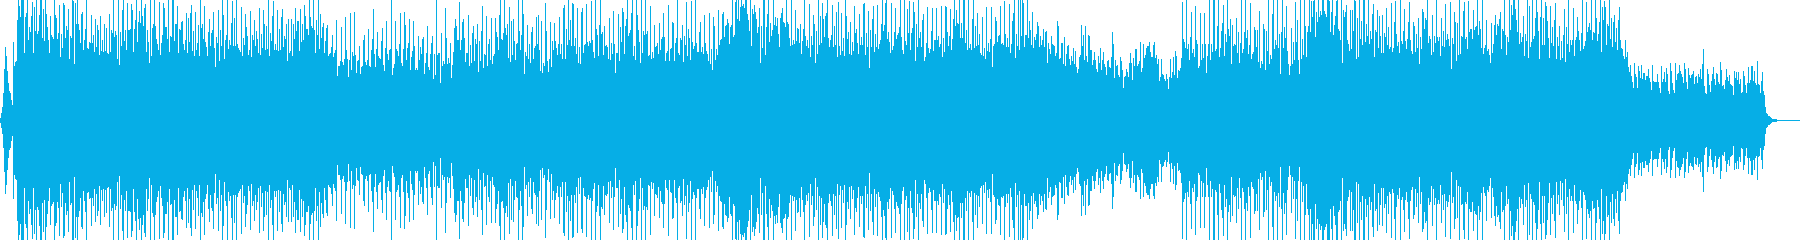 EDMポップで明るいクラブ系-15の再生済みの波形